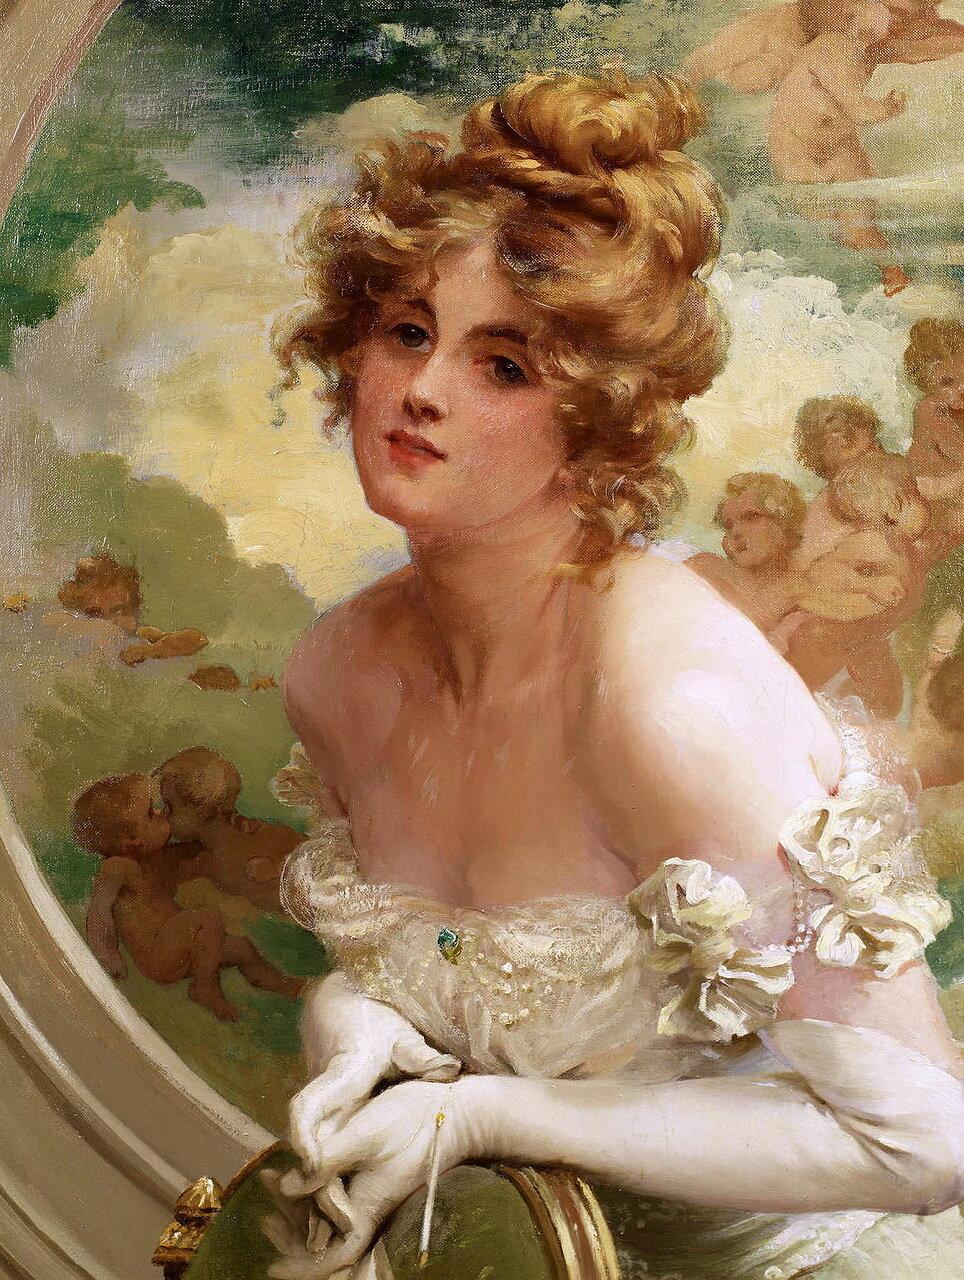 St. George Hare (Irish, 1857-1933) - The Debutante